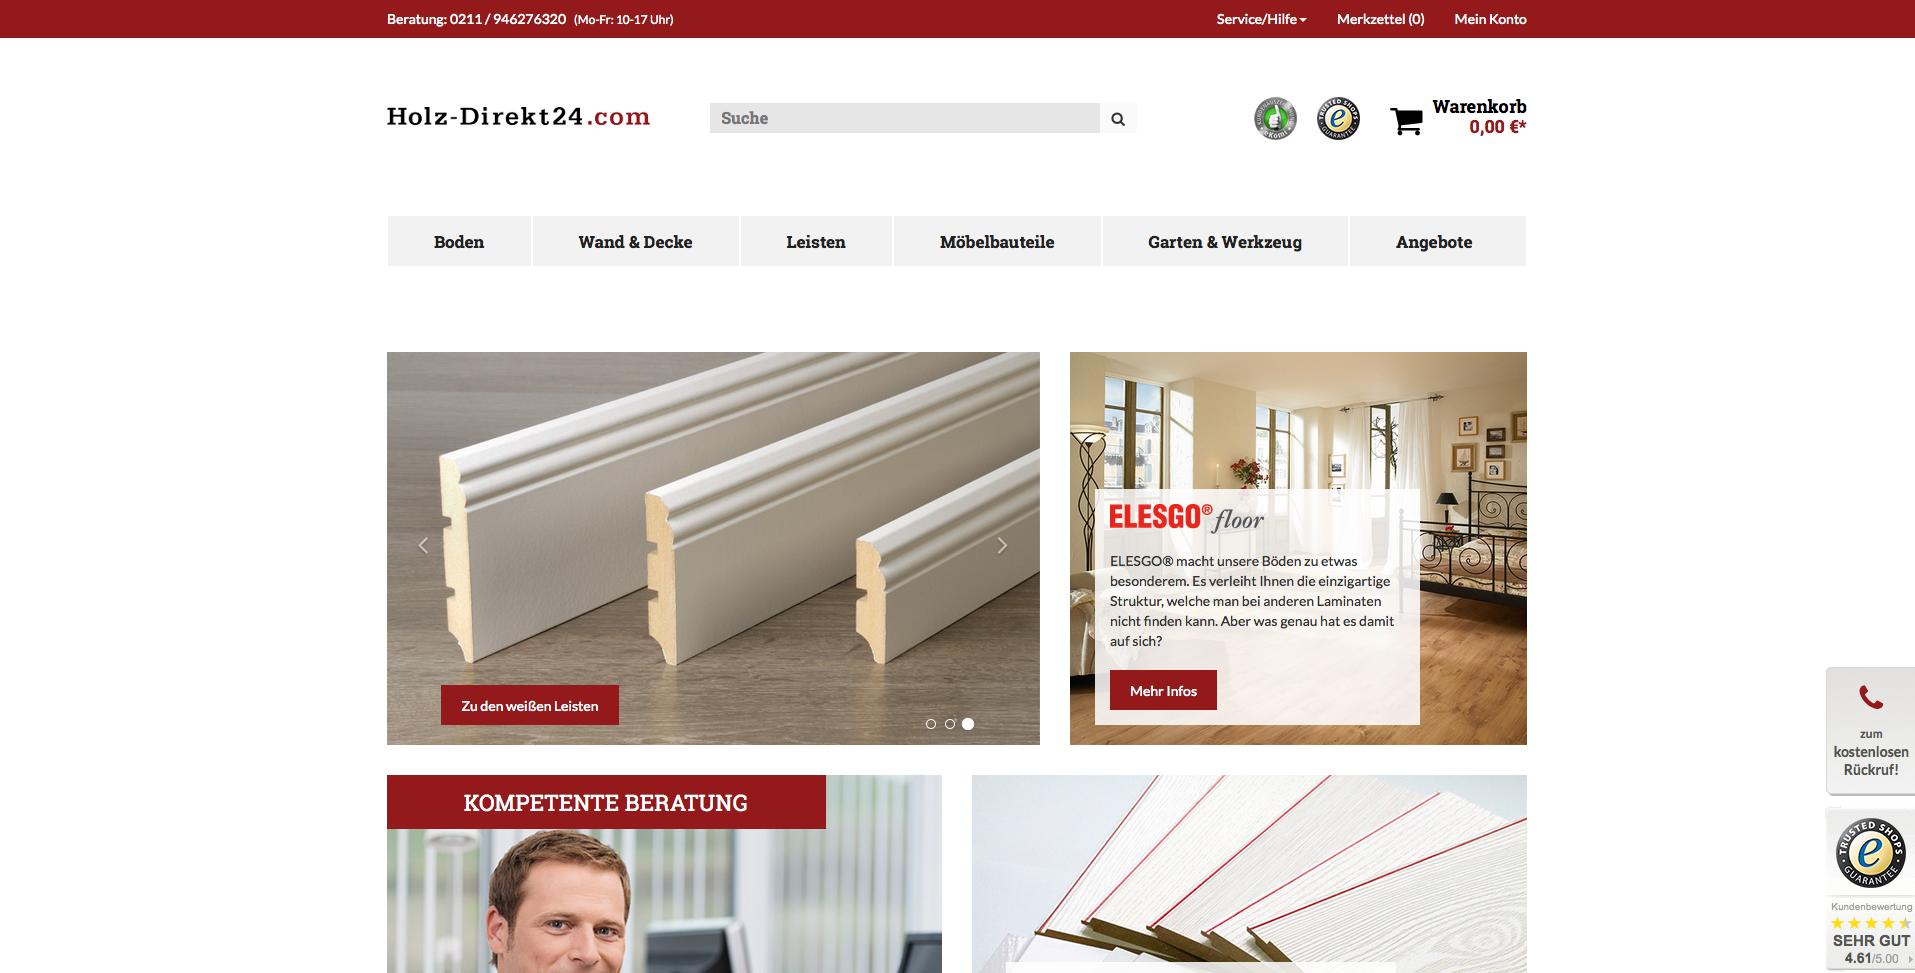 Holz-Direkt24.com Gutschein